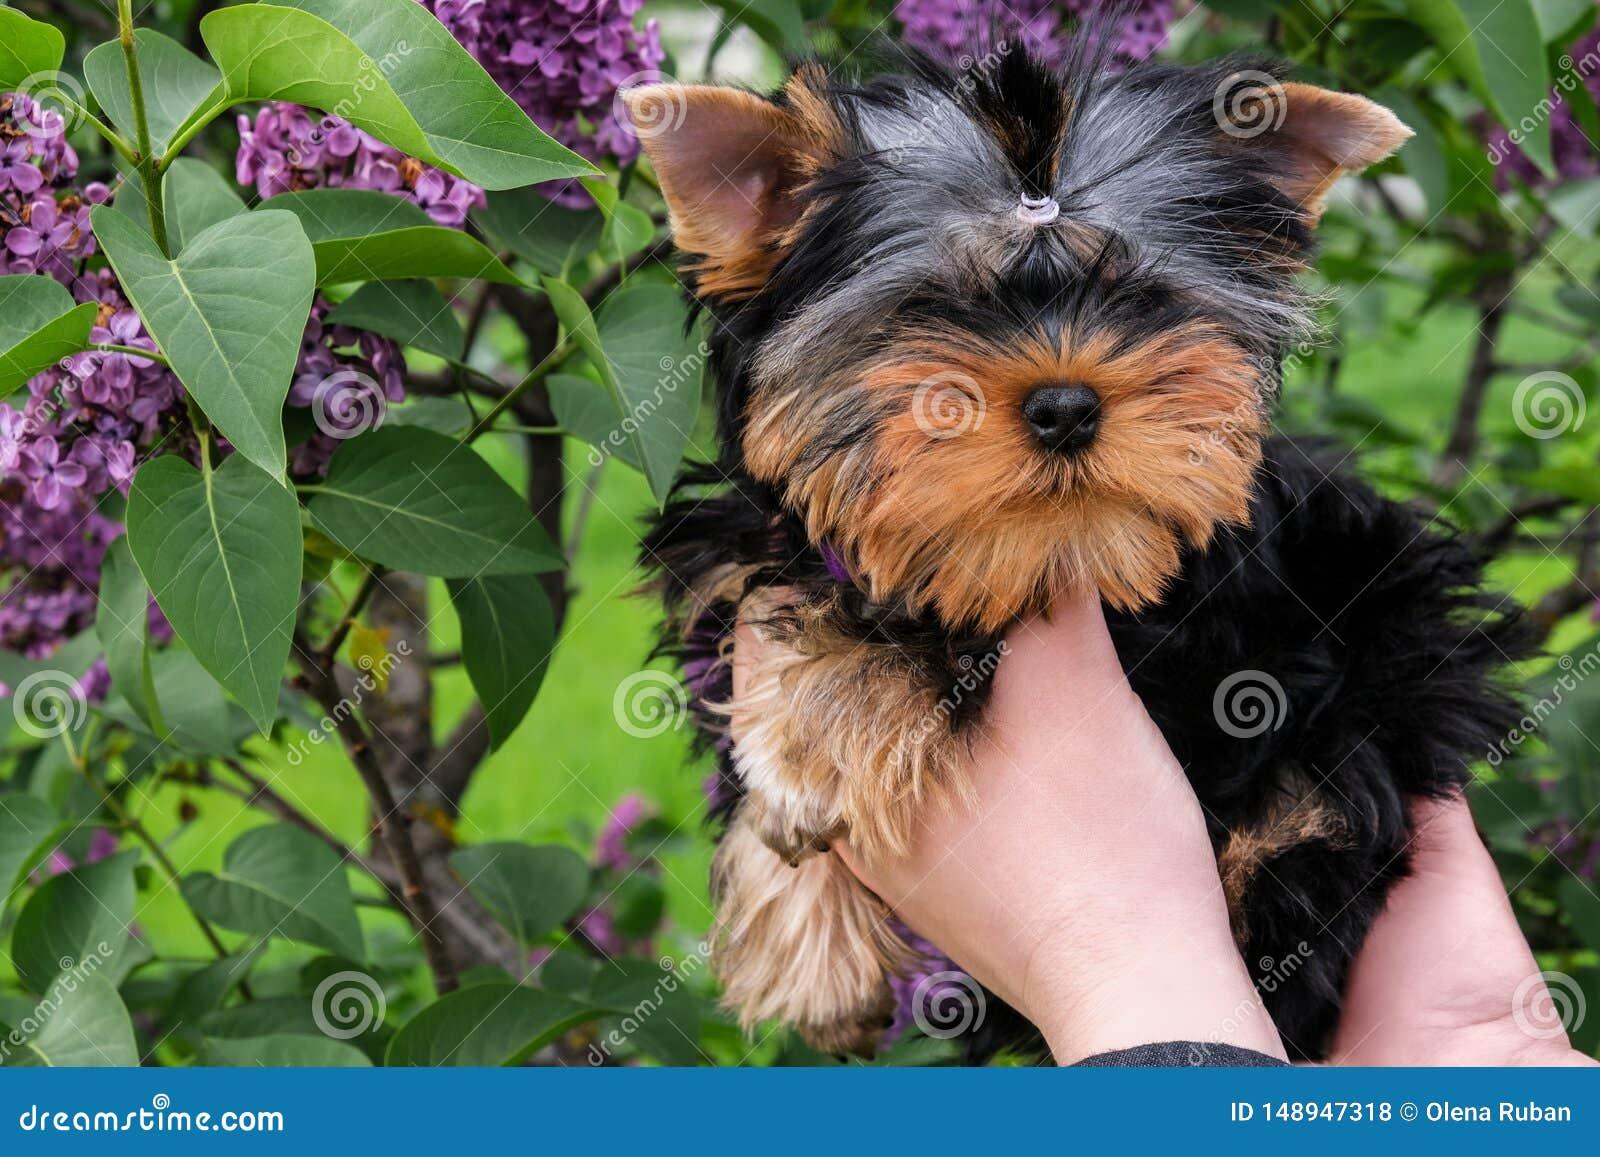 Little black puppy in female hands